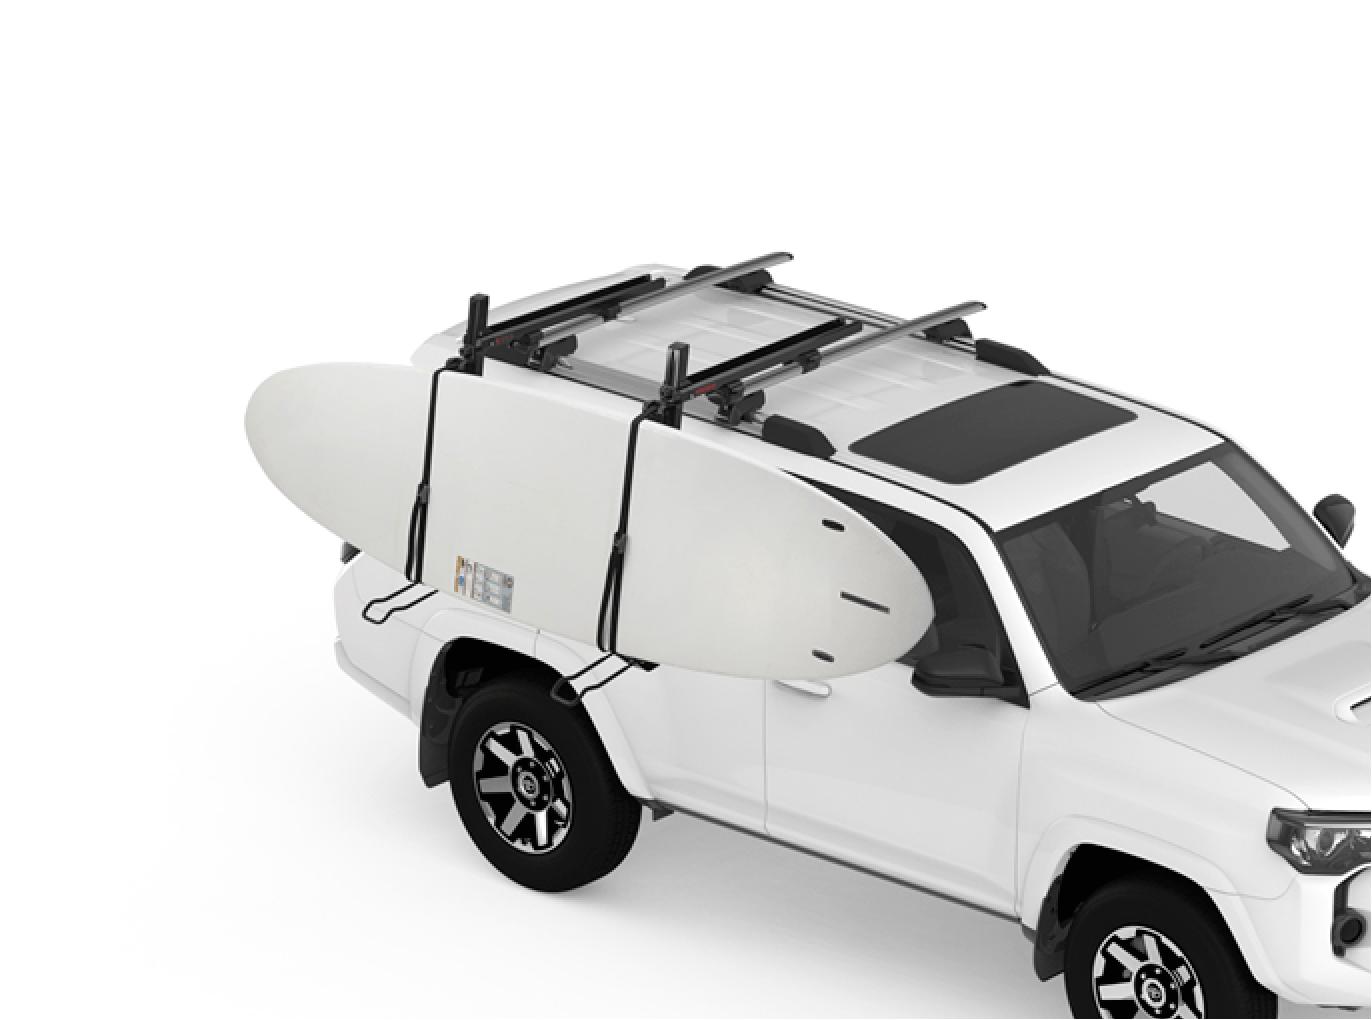 Luggage Rack for Sports Car Demo Showdown Side Loading Sup and Kayak Carrier Modula Racks